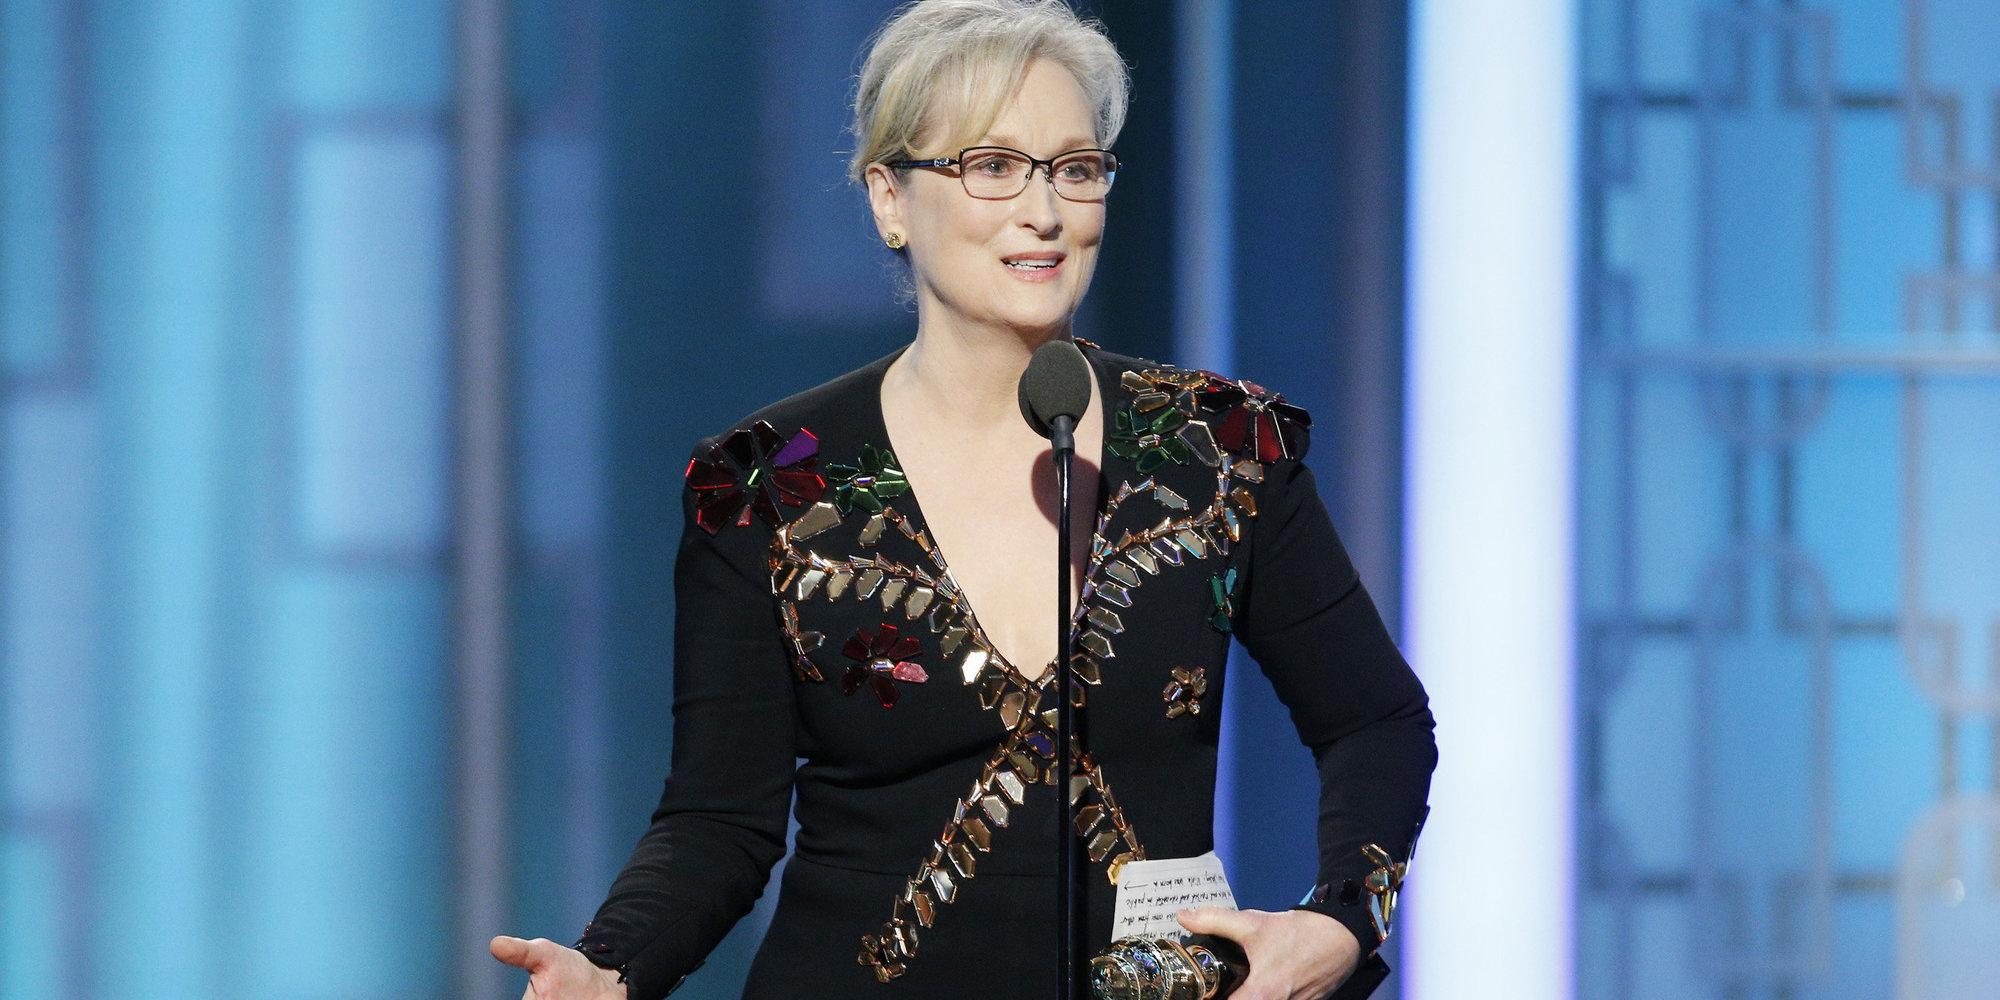 Thunder Dicas: 'Meryl Streep' 1